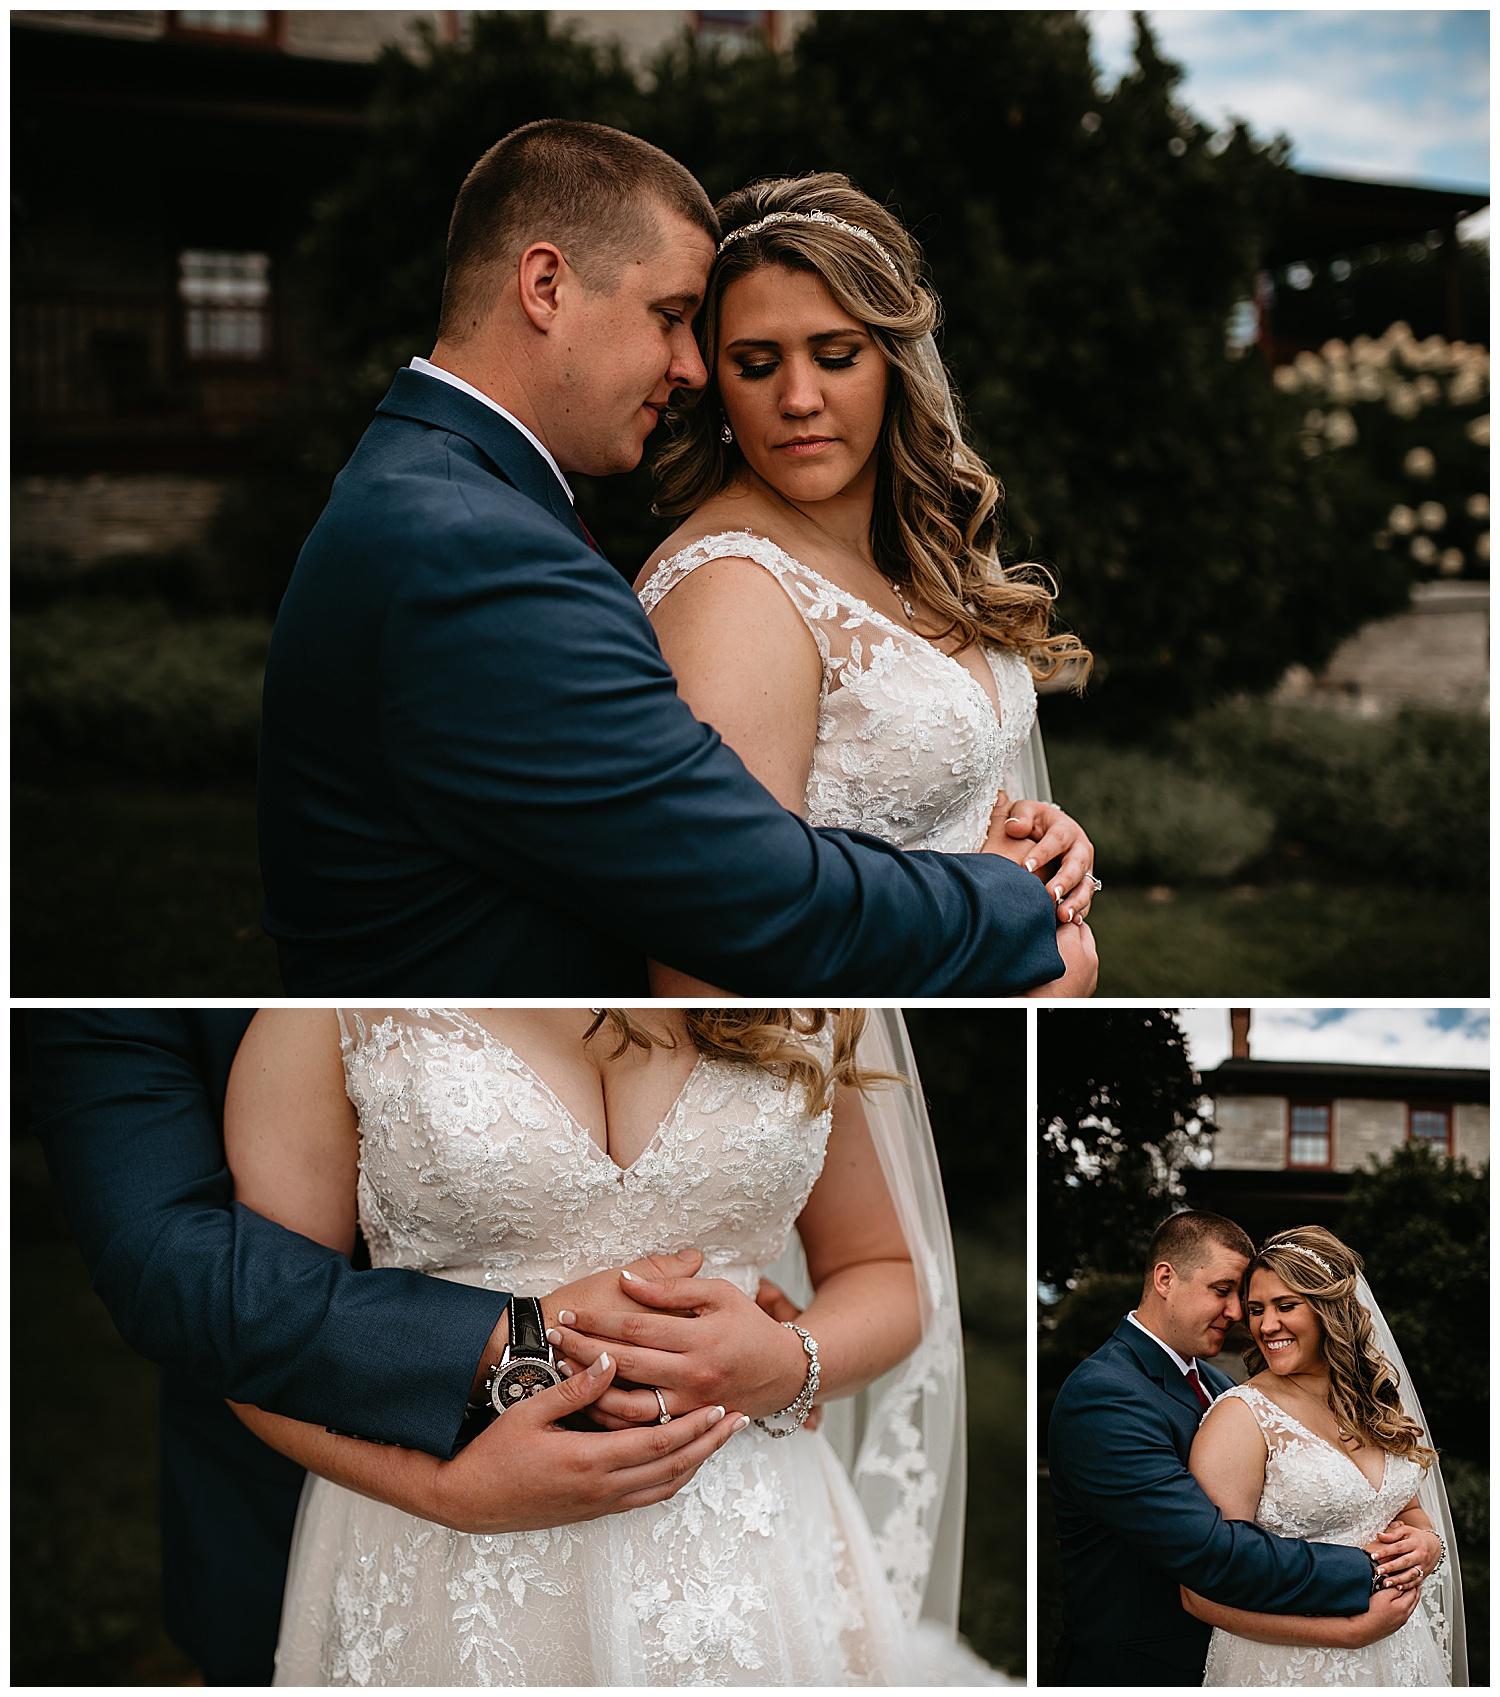 NEPA-Bloomgsburg-Wedding-Photographer-at-The-Barn-at-Greystone-Farms-Watsontown-PA_0033.jpg